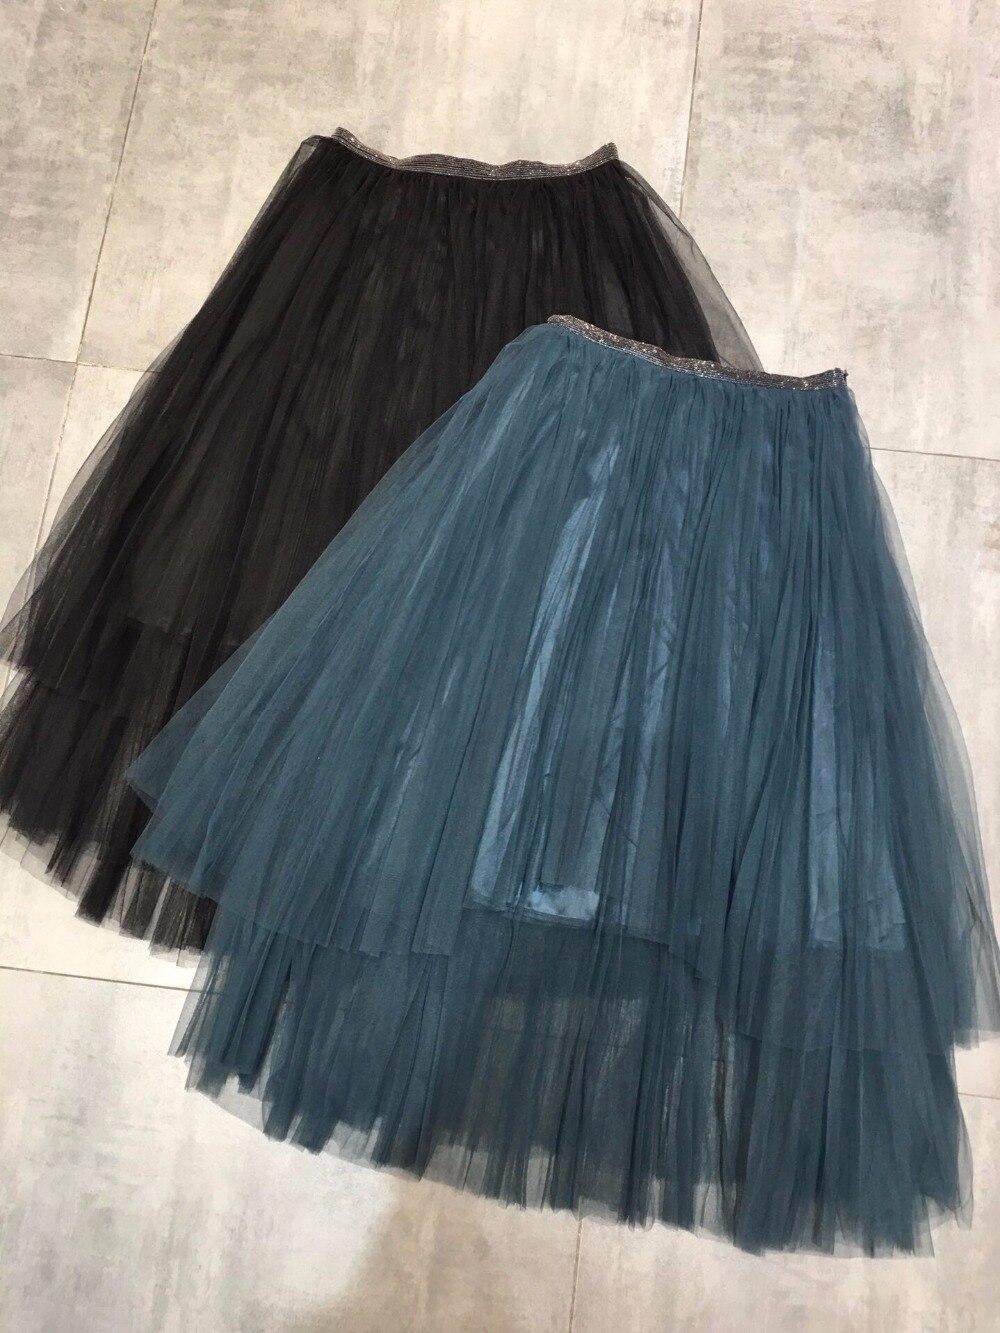 Jupe Femmes Ddxgz3 Mode 2018 2 Maille De Couleur Luxe Perles xqTfWwBSY